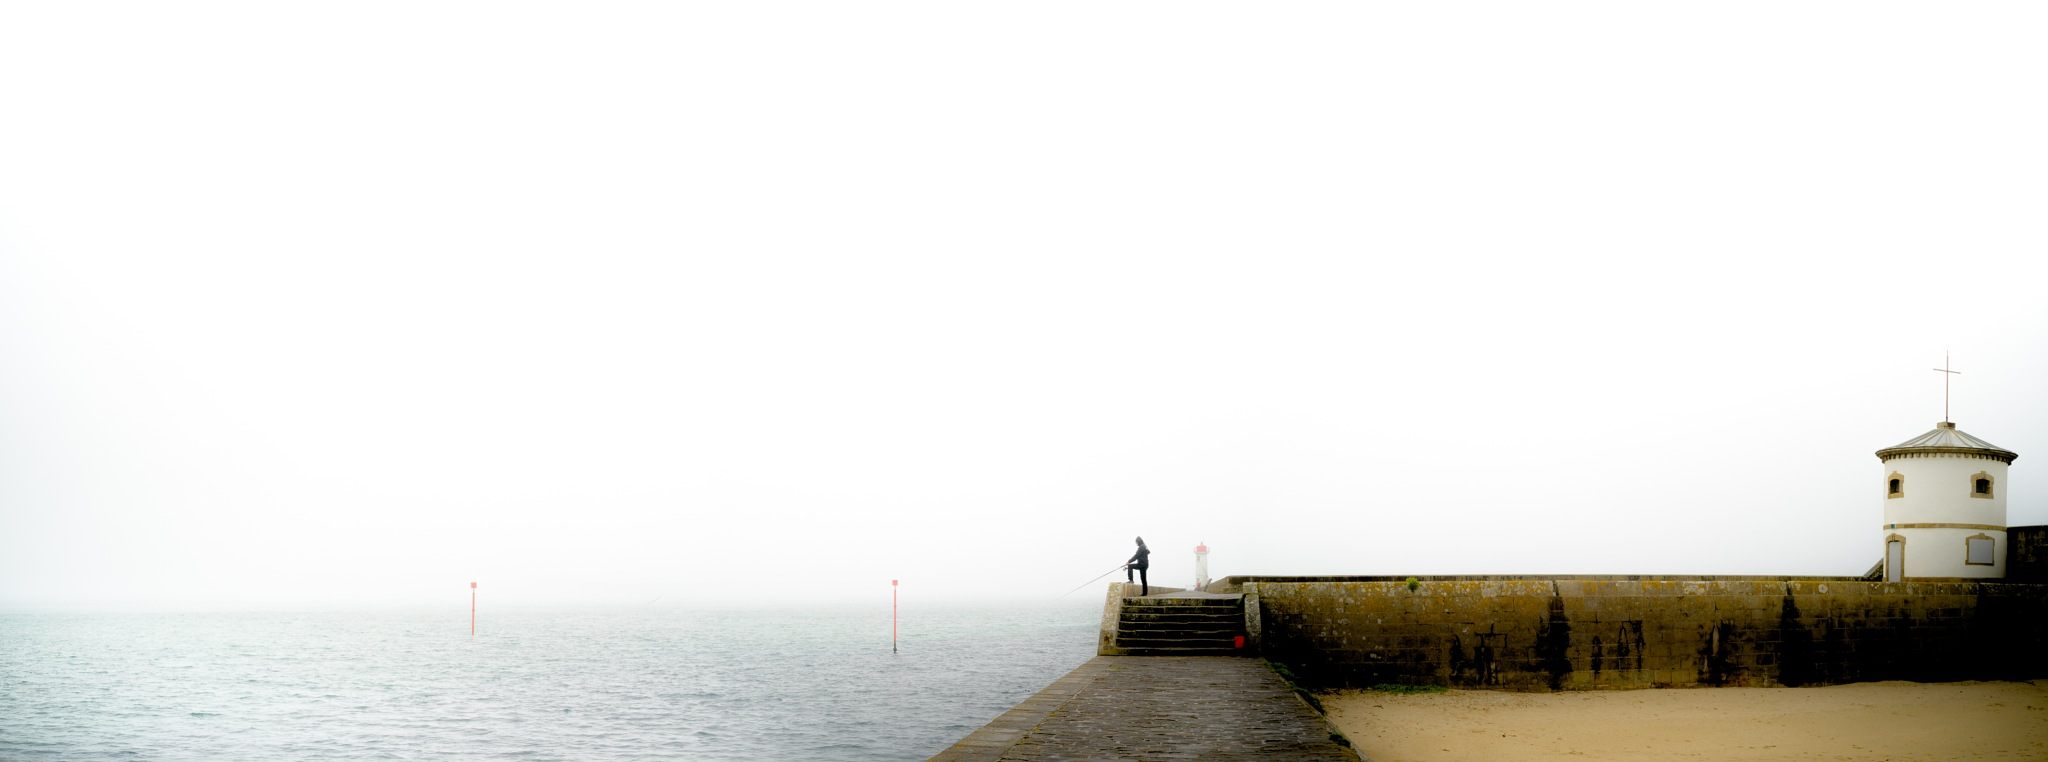 Audierne, Bretagne  by Piotr Jaxa